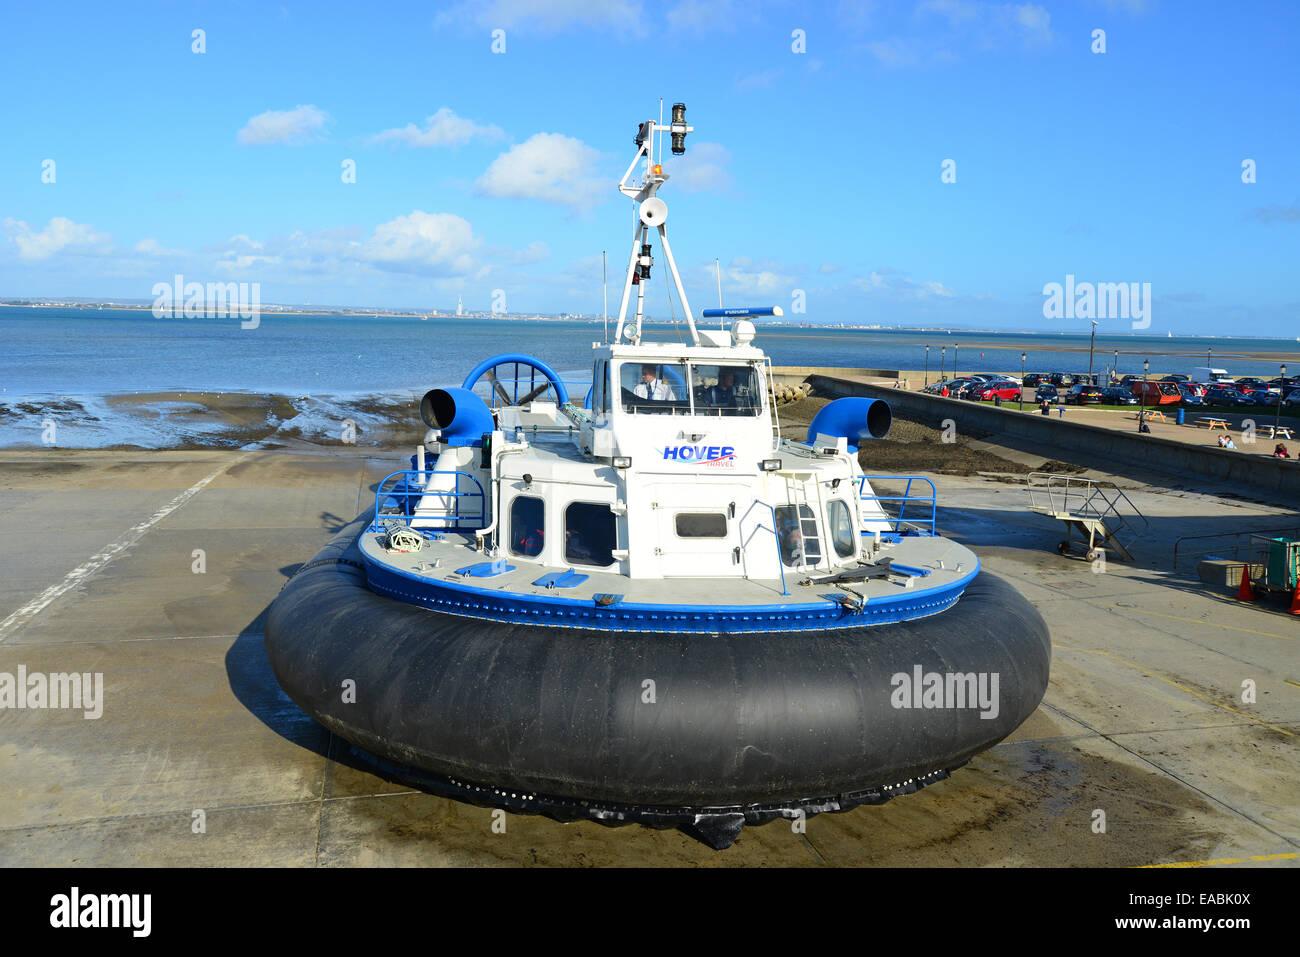 Hover Travel hovercraft, Ryde Harbour, Ryde, Isle of Wight, England, United Kingdom - Stock Image